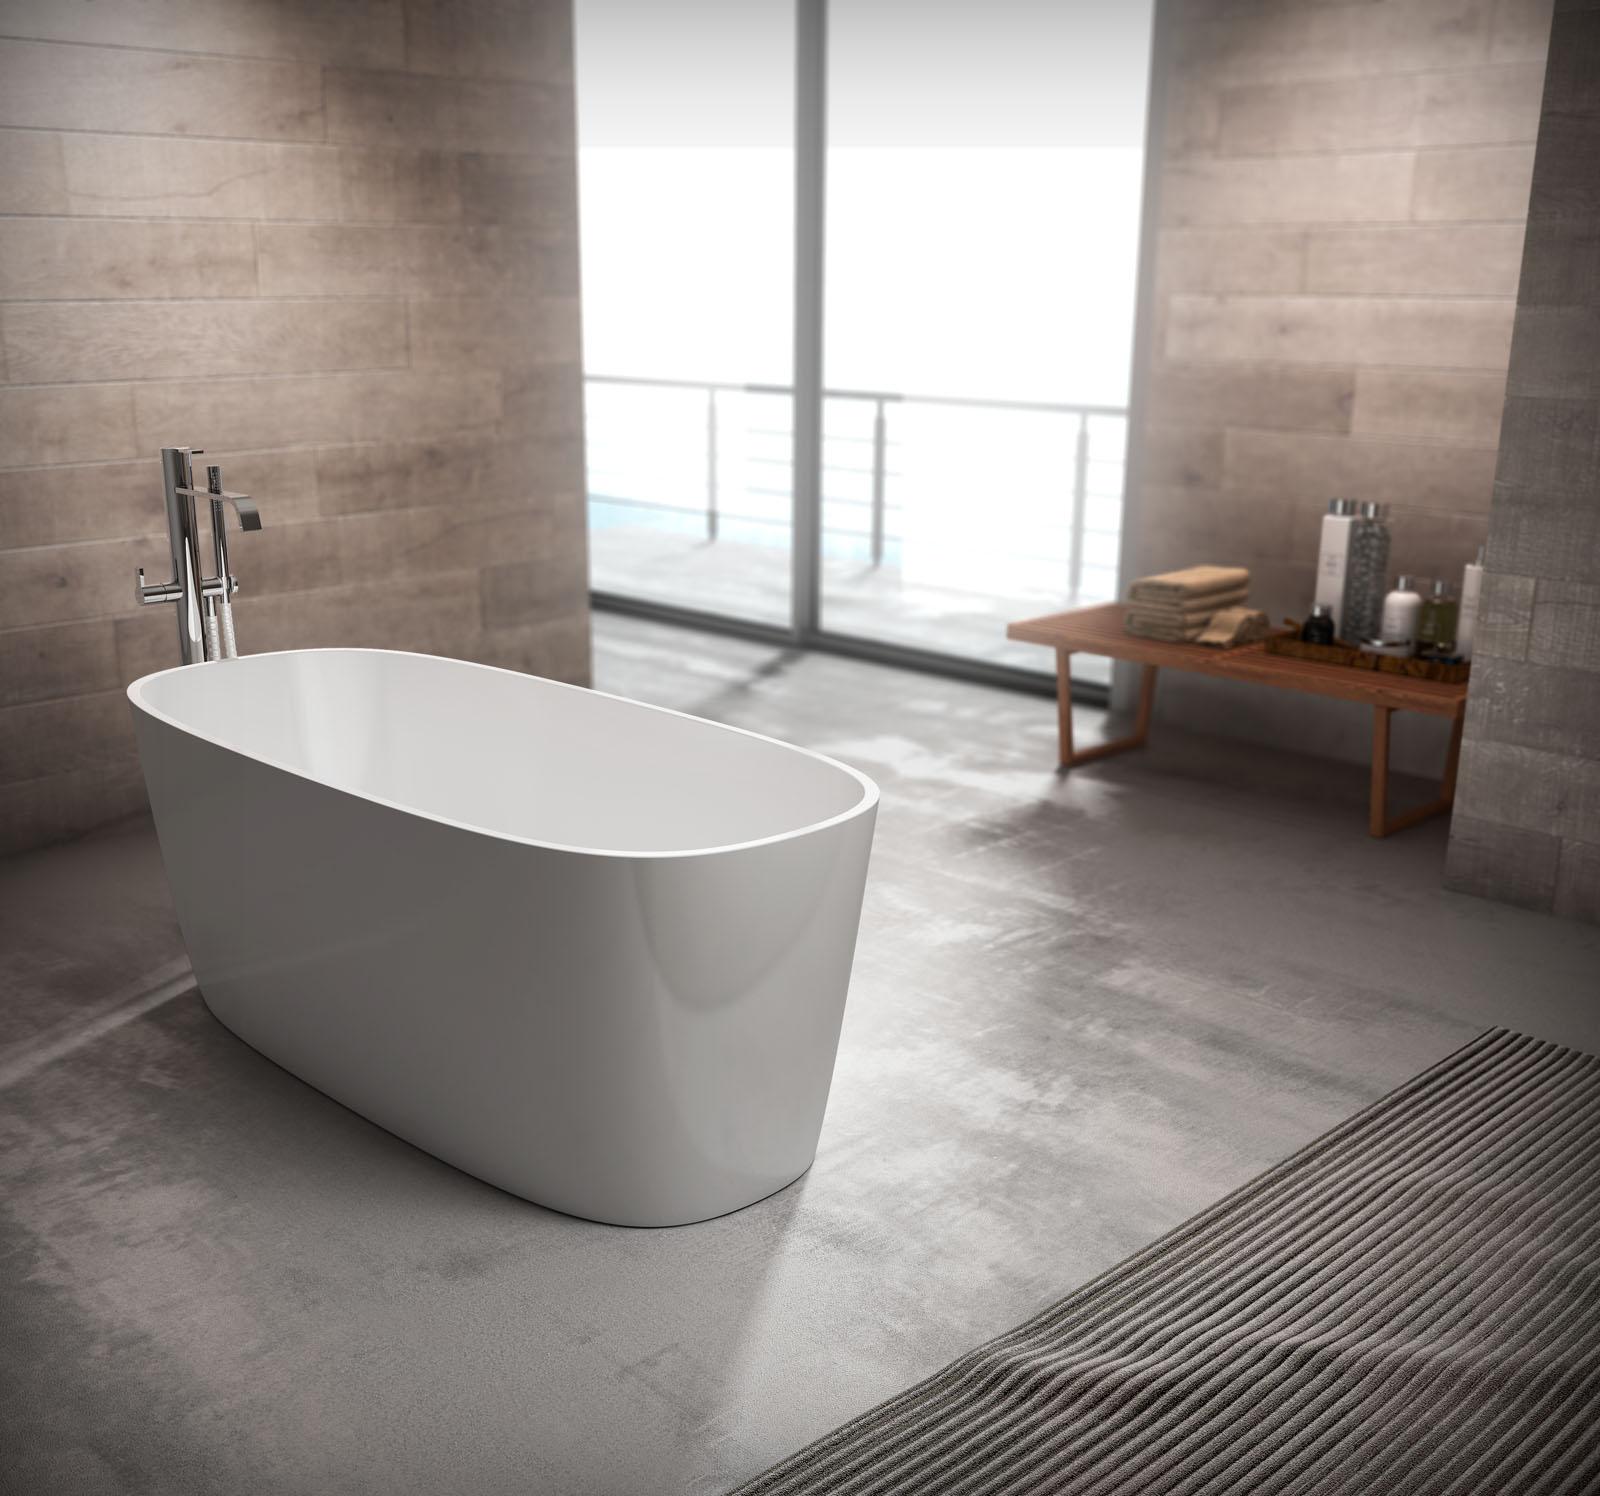 Loop vasca da bagno di design disenia - Vasca bagno design ...